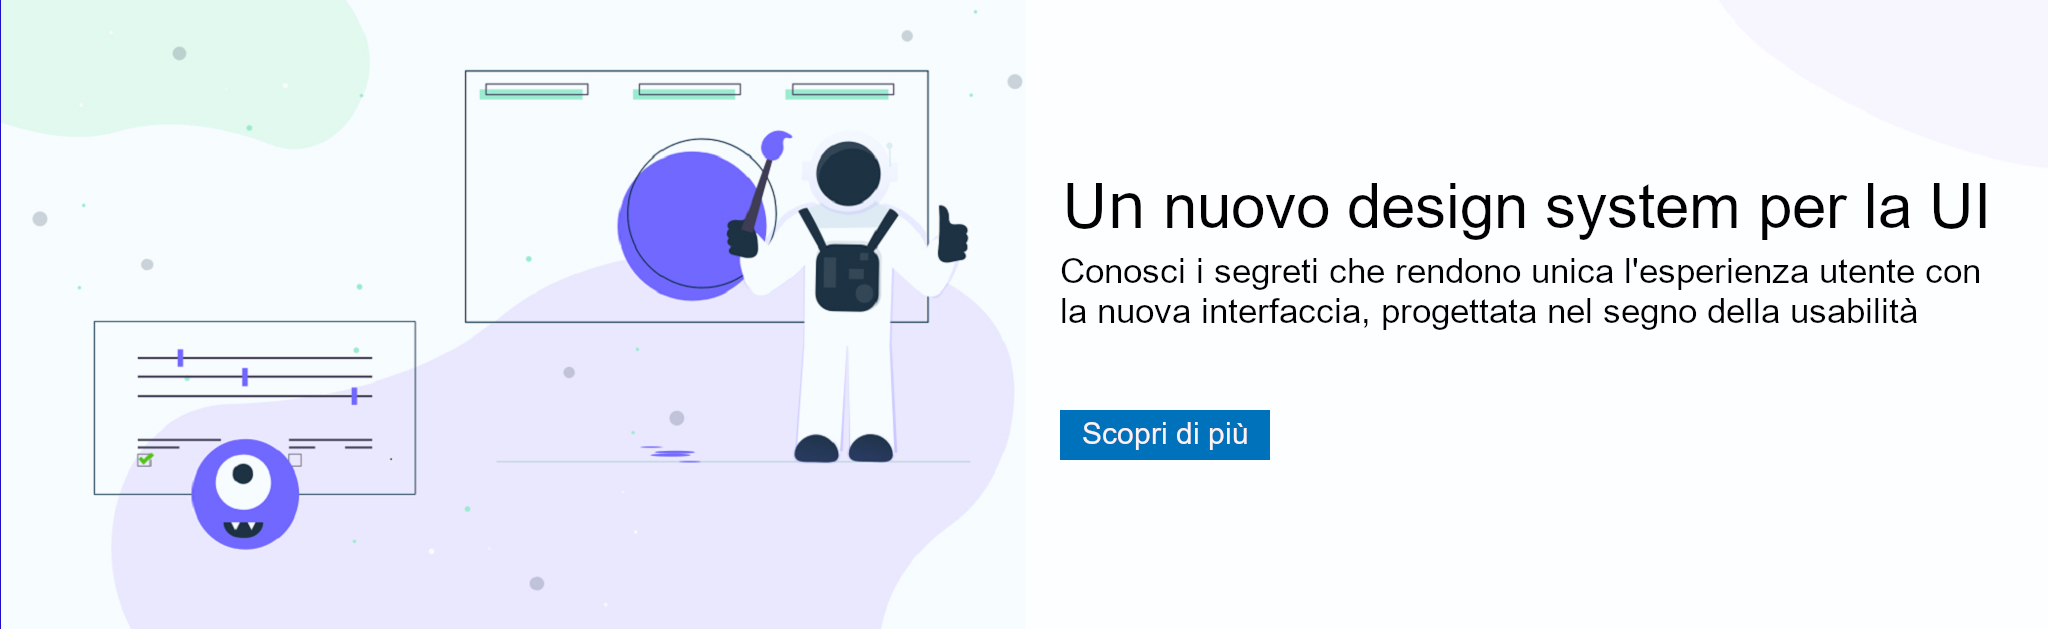 Nuovo design system